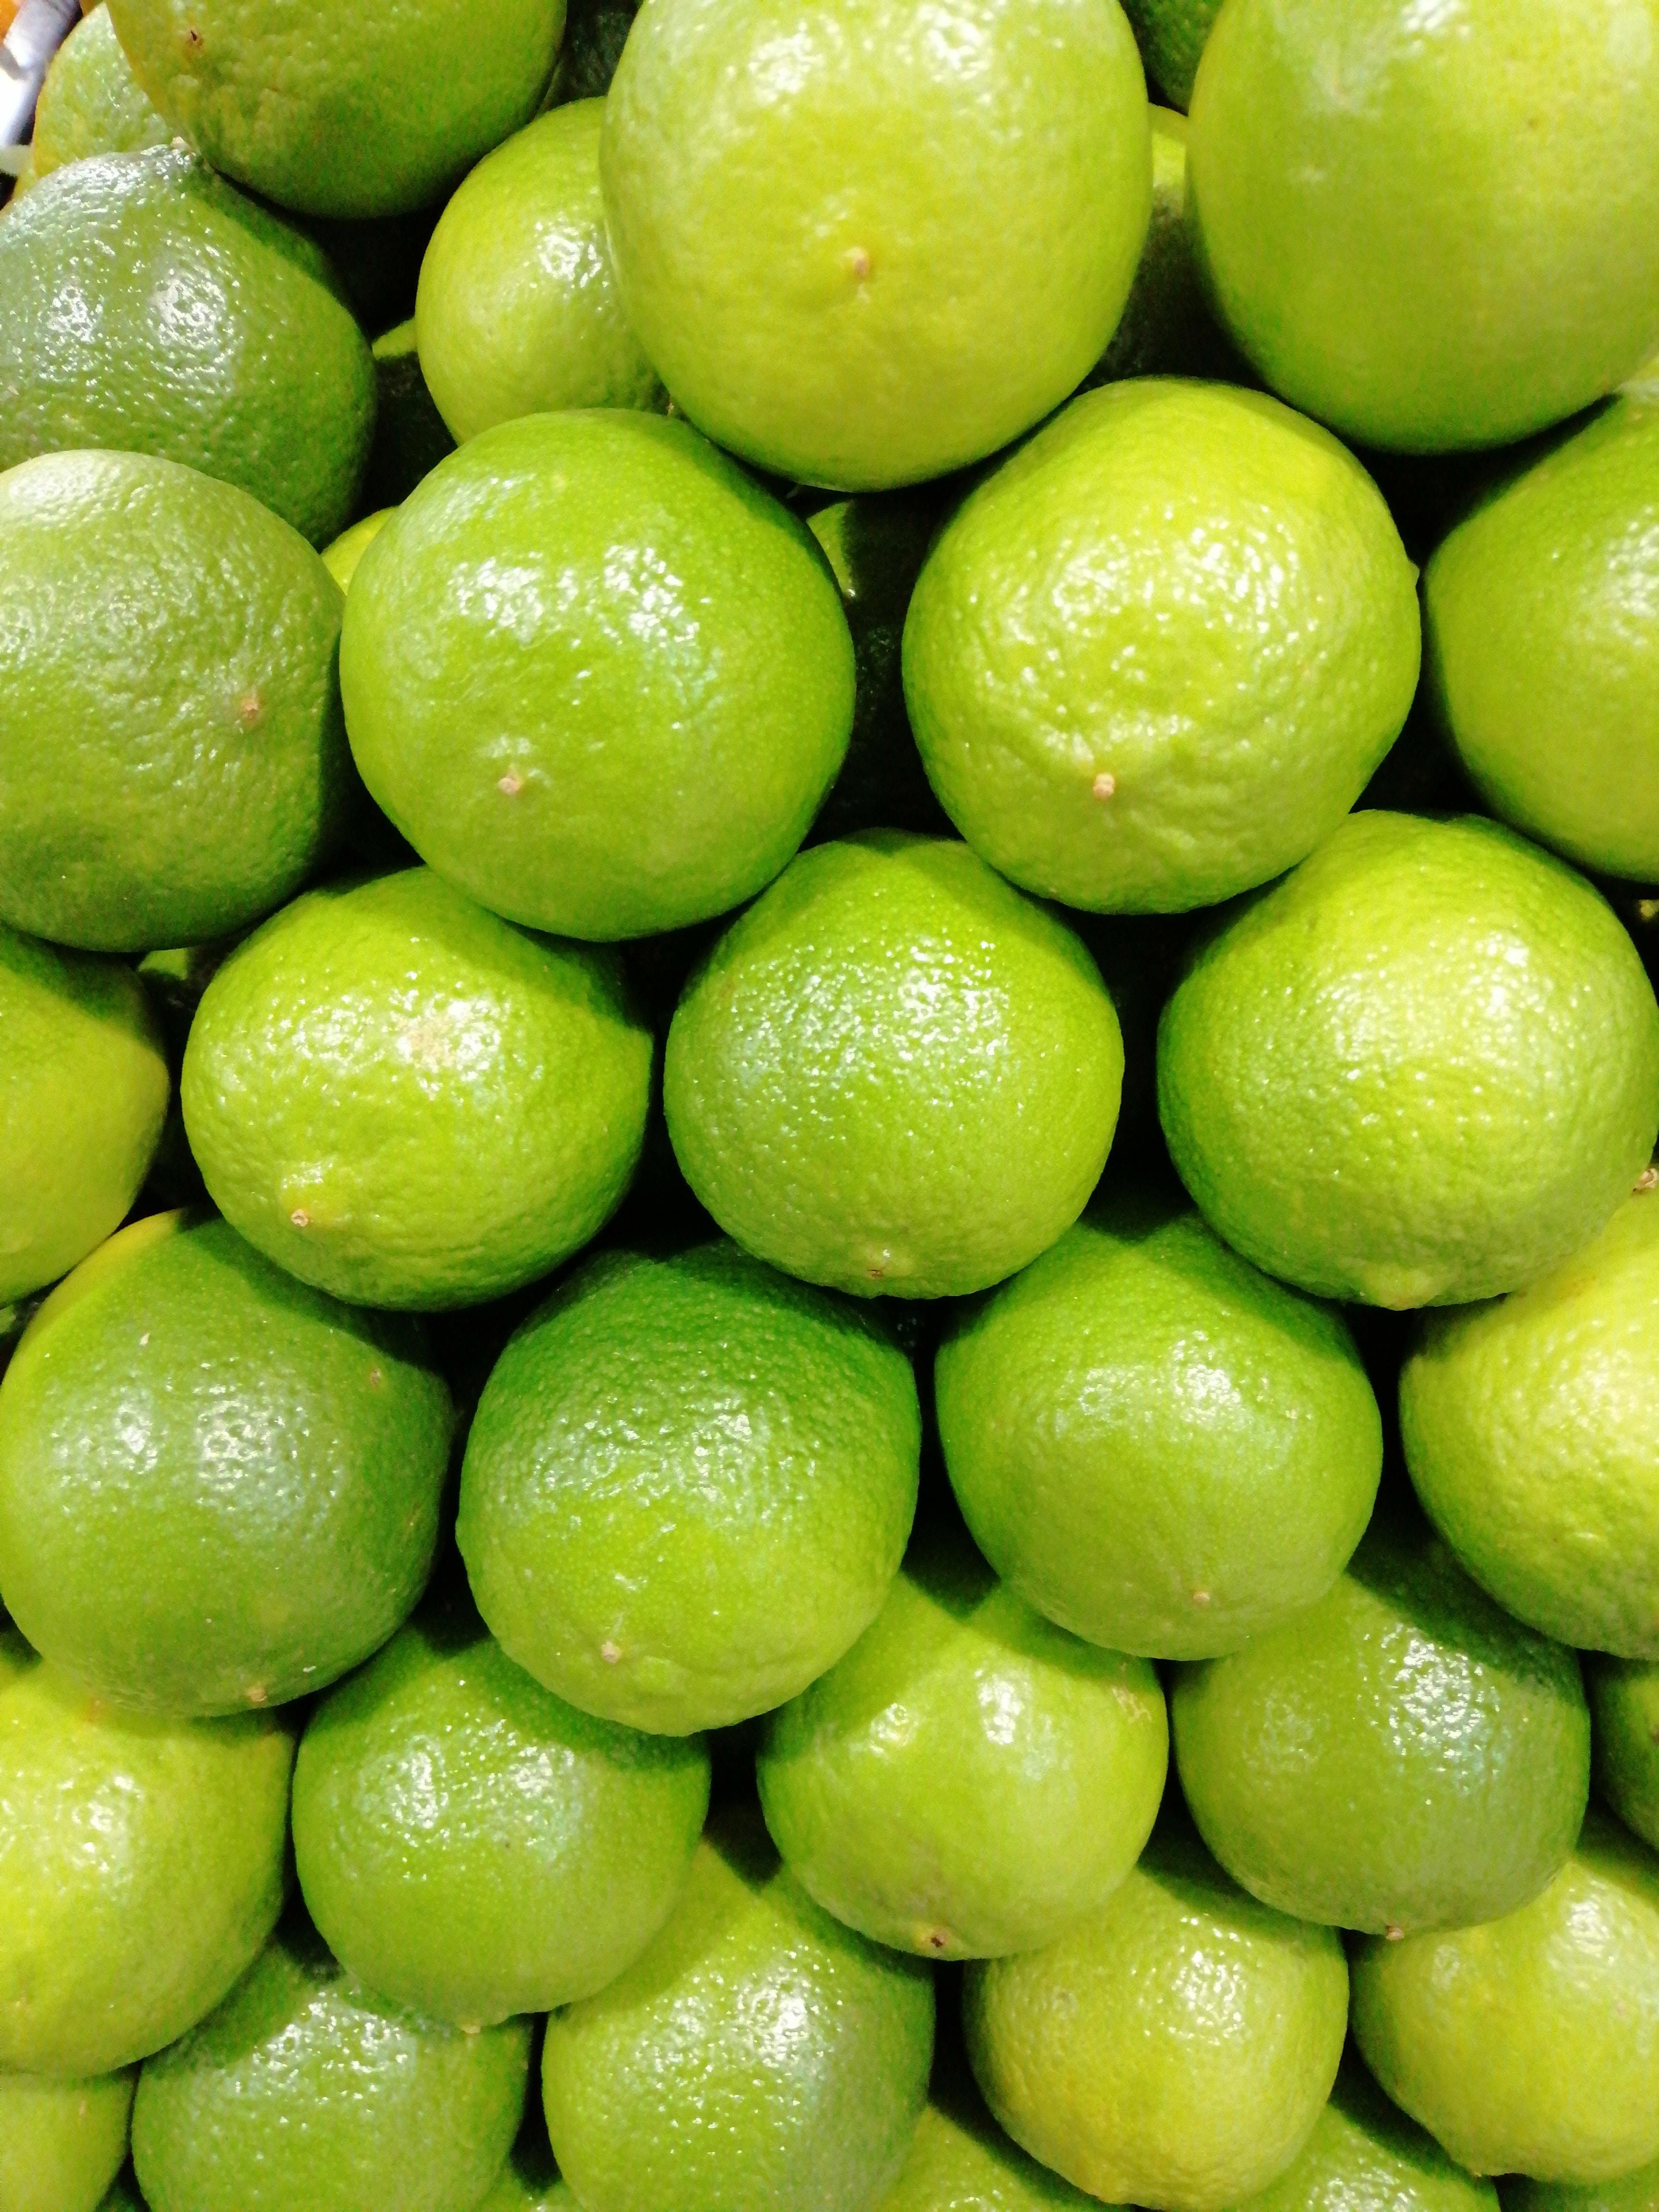 green and yellow mango fruits